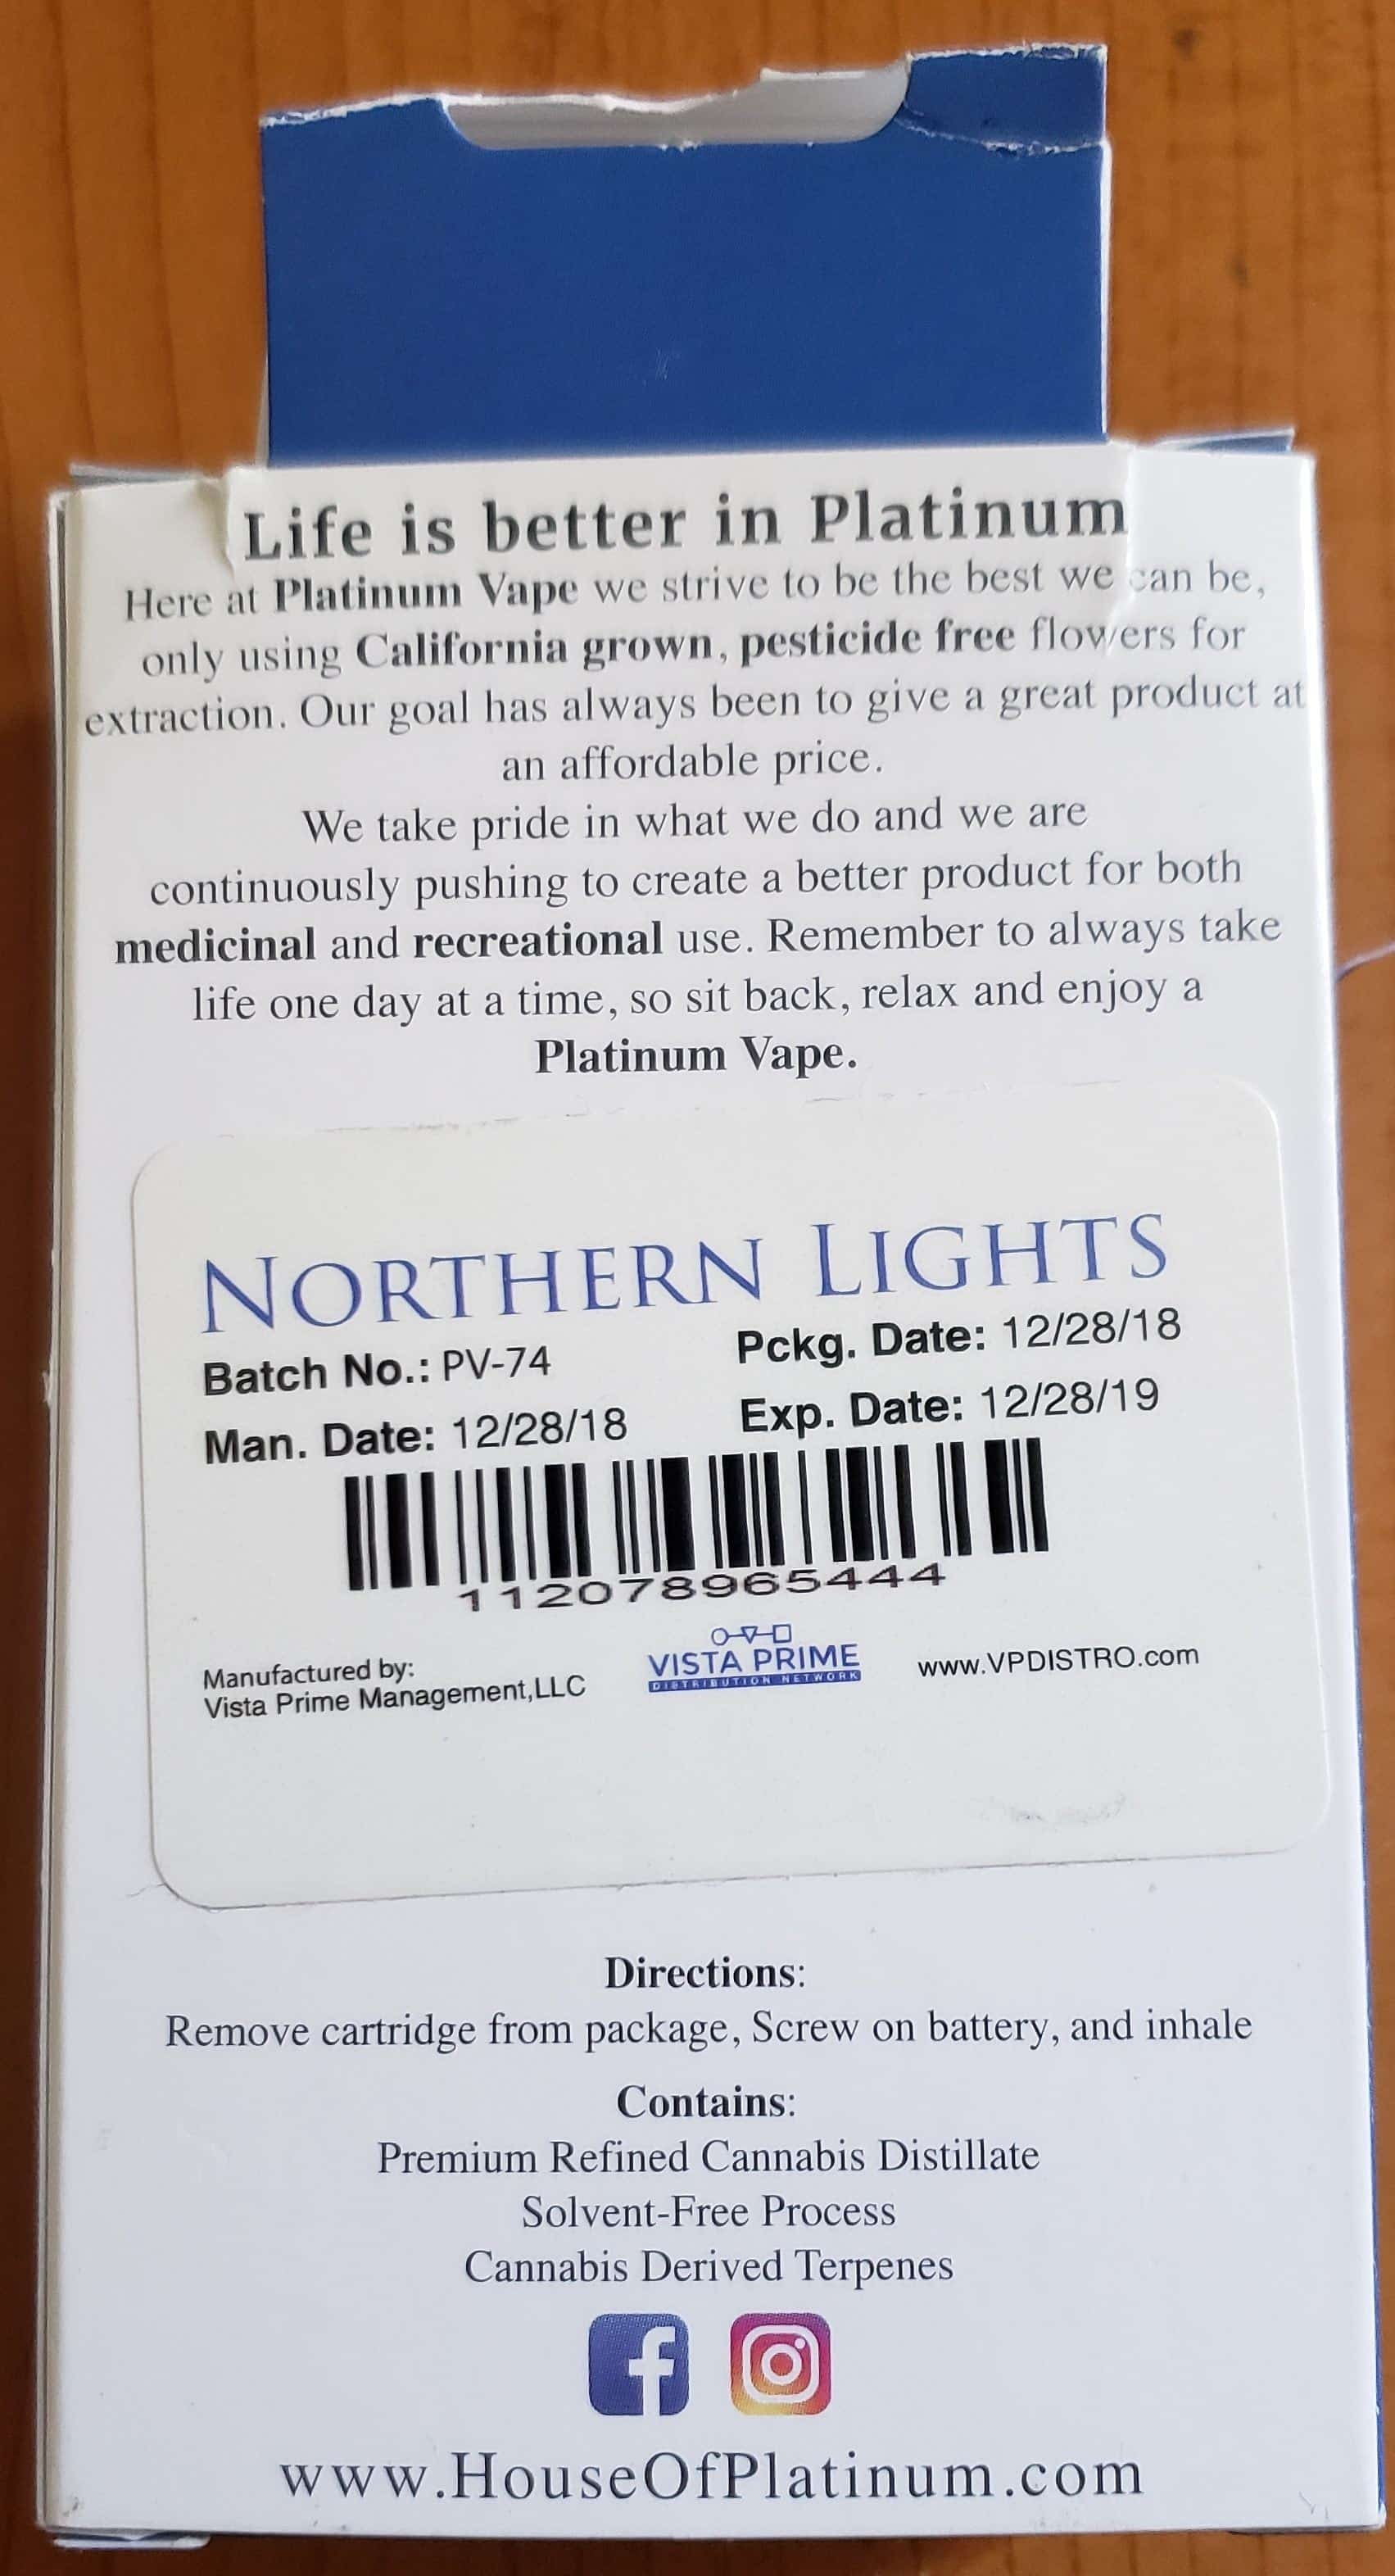 Platinum Vape Label